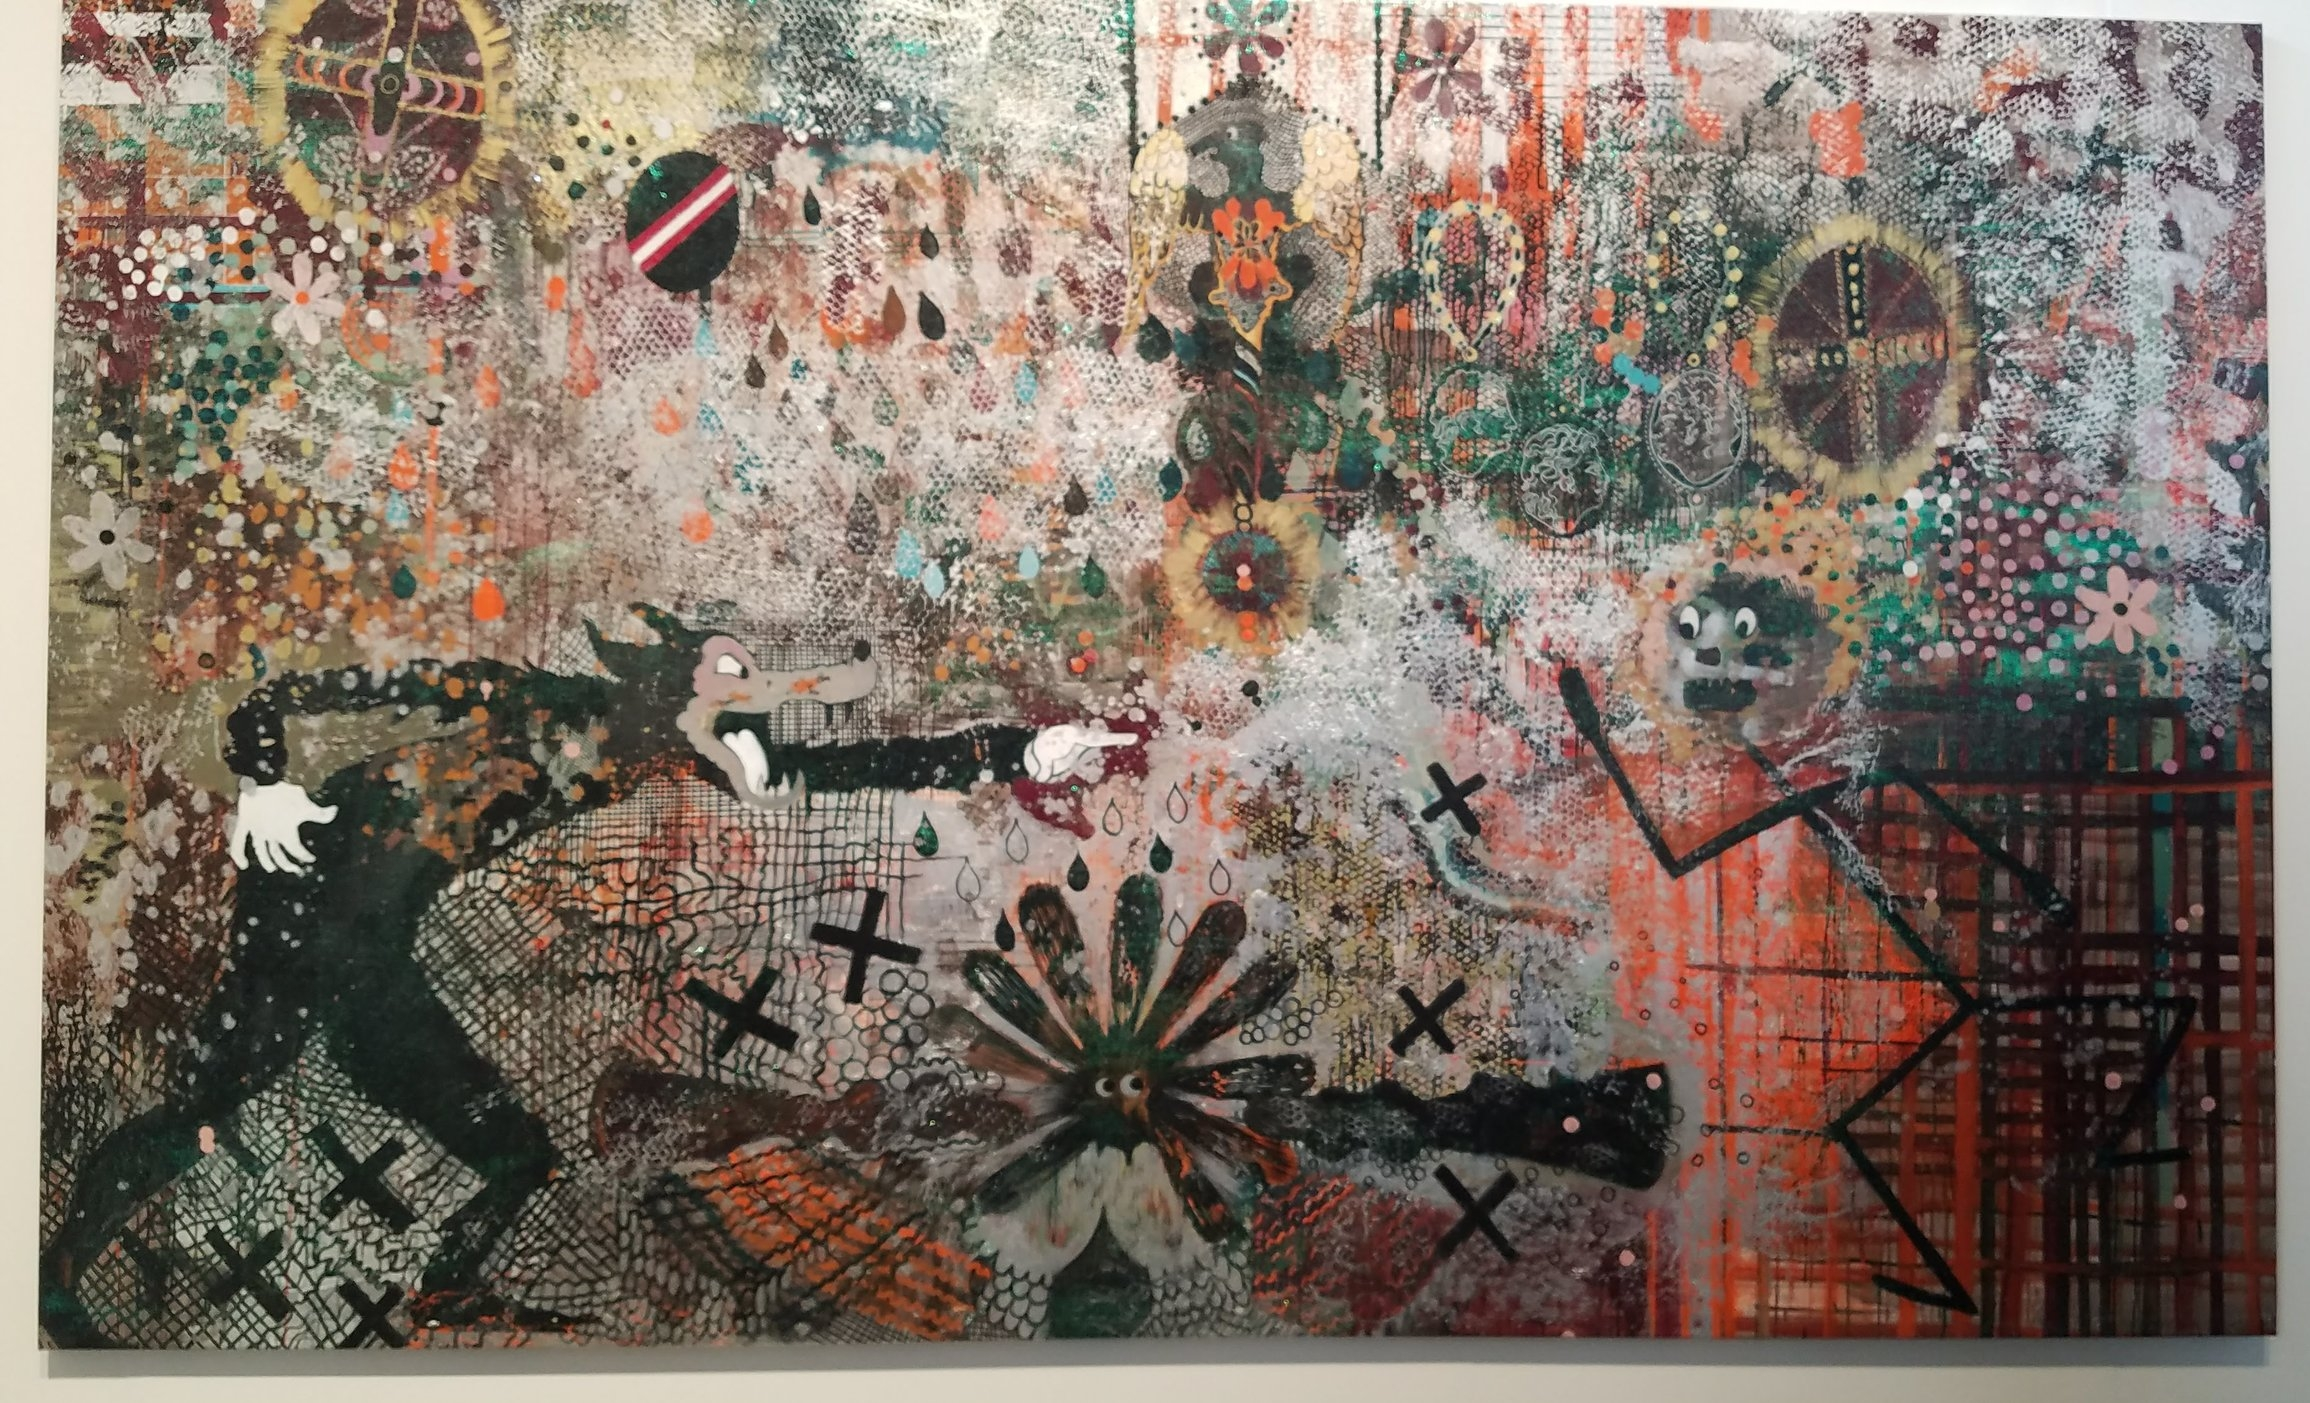 Helen Delprat courtesy of Galerie Chrisophe Gaillard